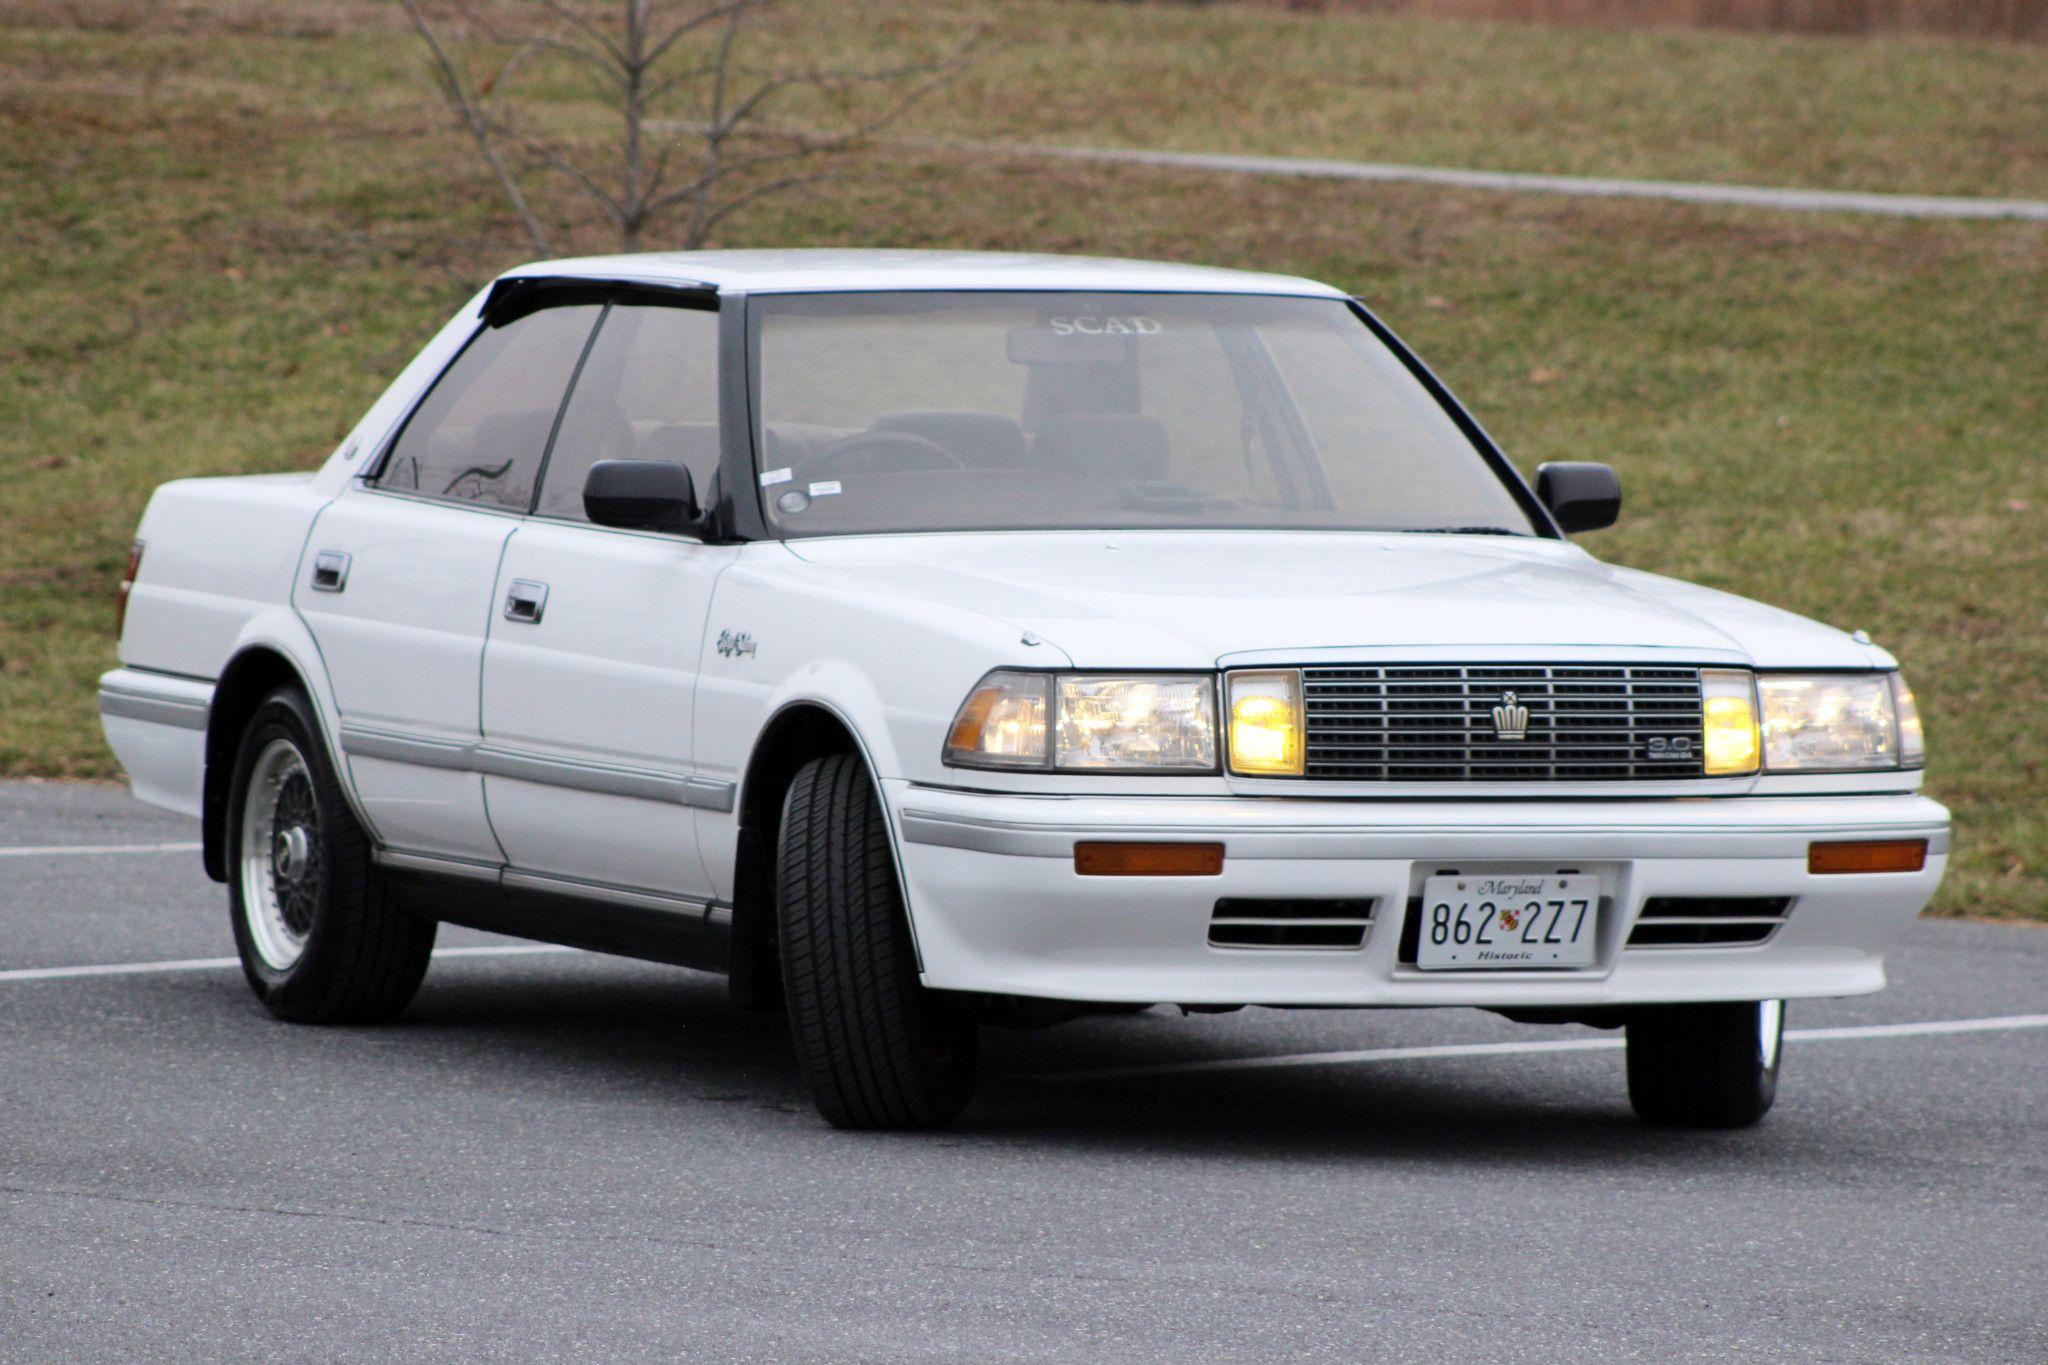 1990 Toyota Crown Royal Saloon | Toyota crown, Toyota, Toyota cars